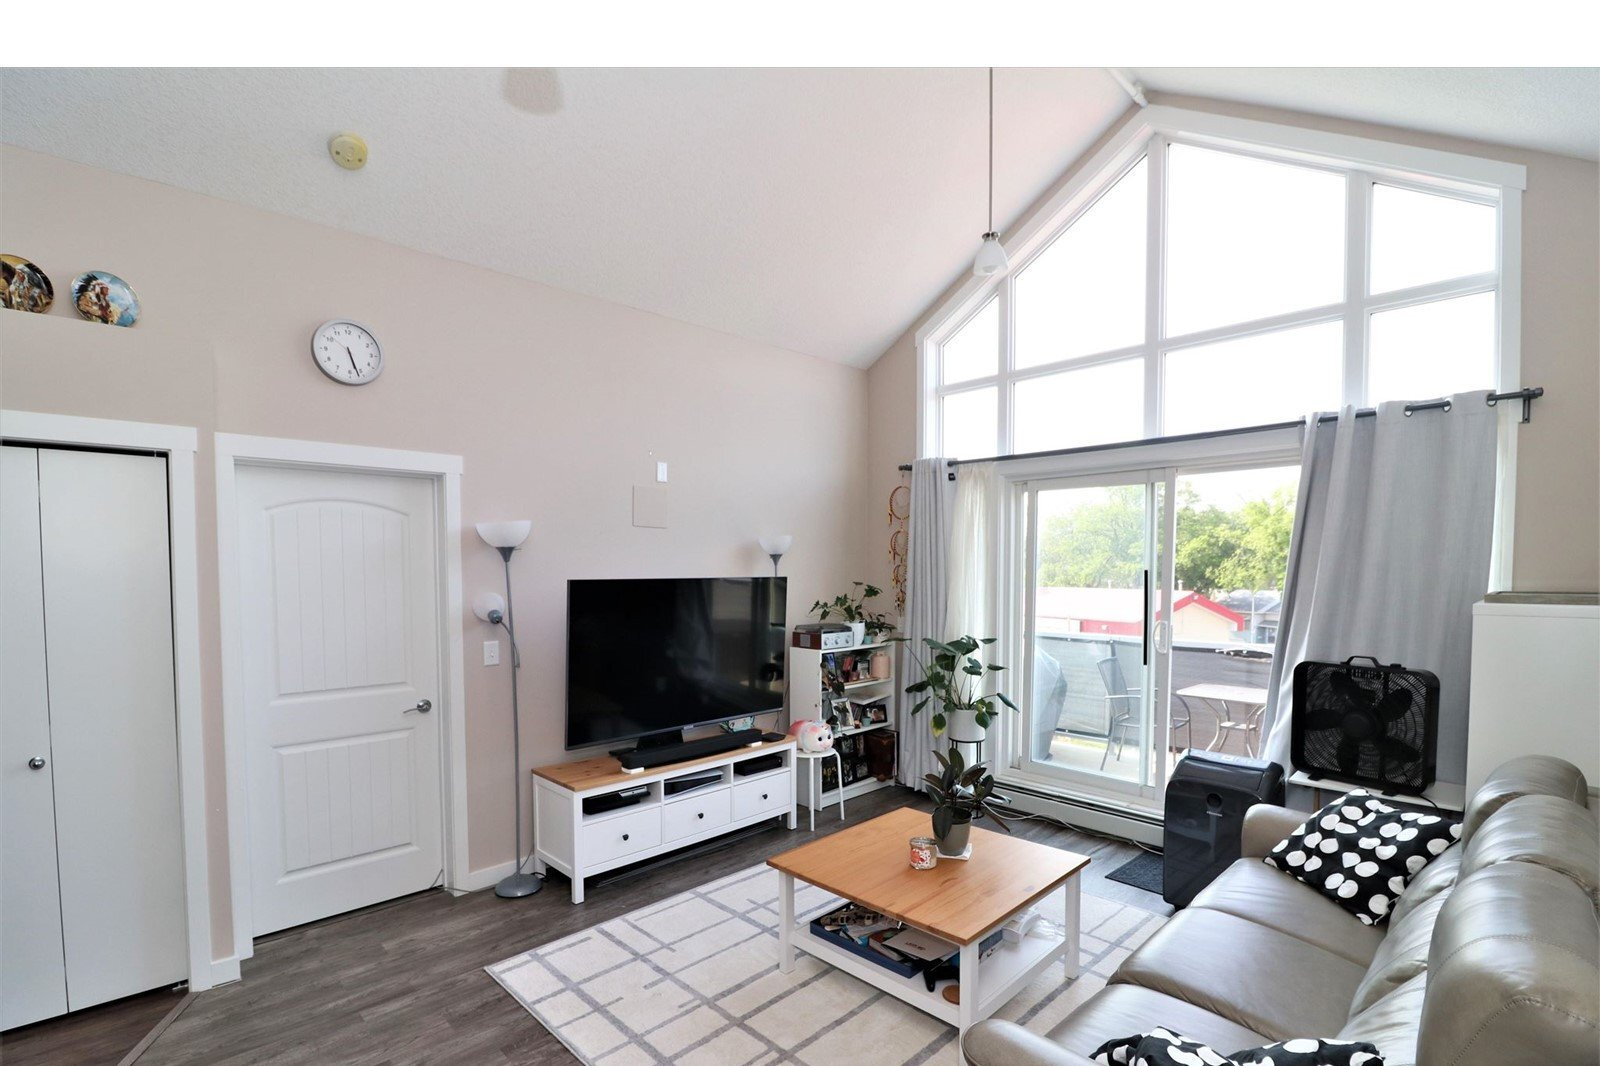 Condo for sale at 9113 111 Av NW Unit 303 Edmonton Alberta - MLS: E4225378